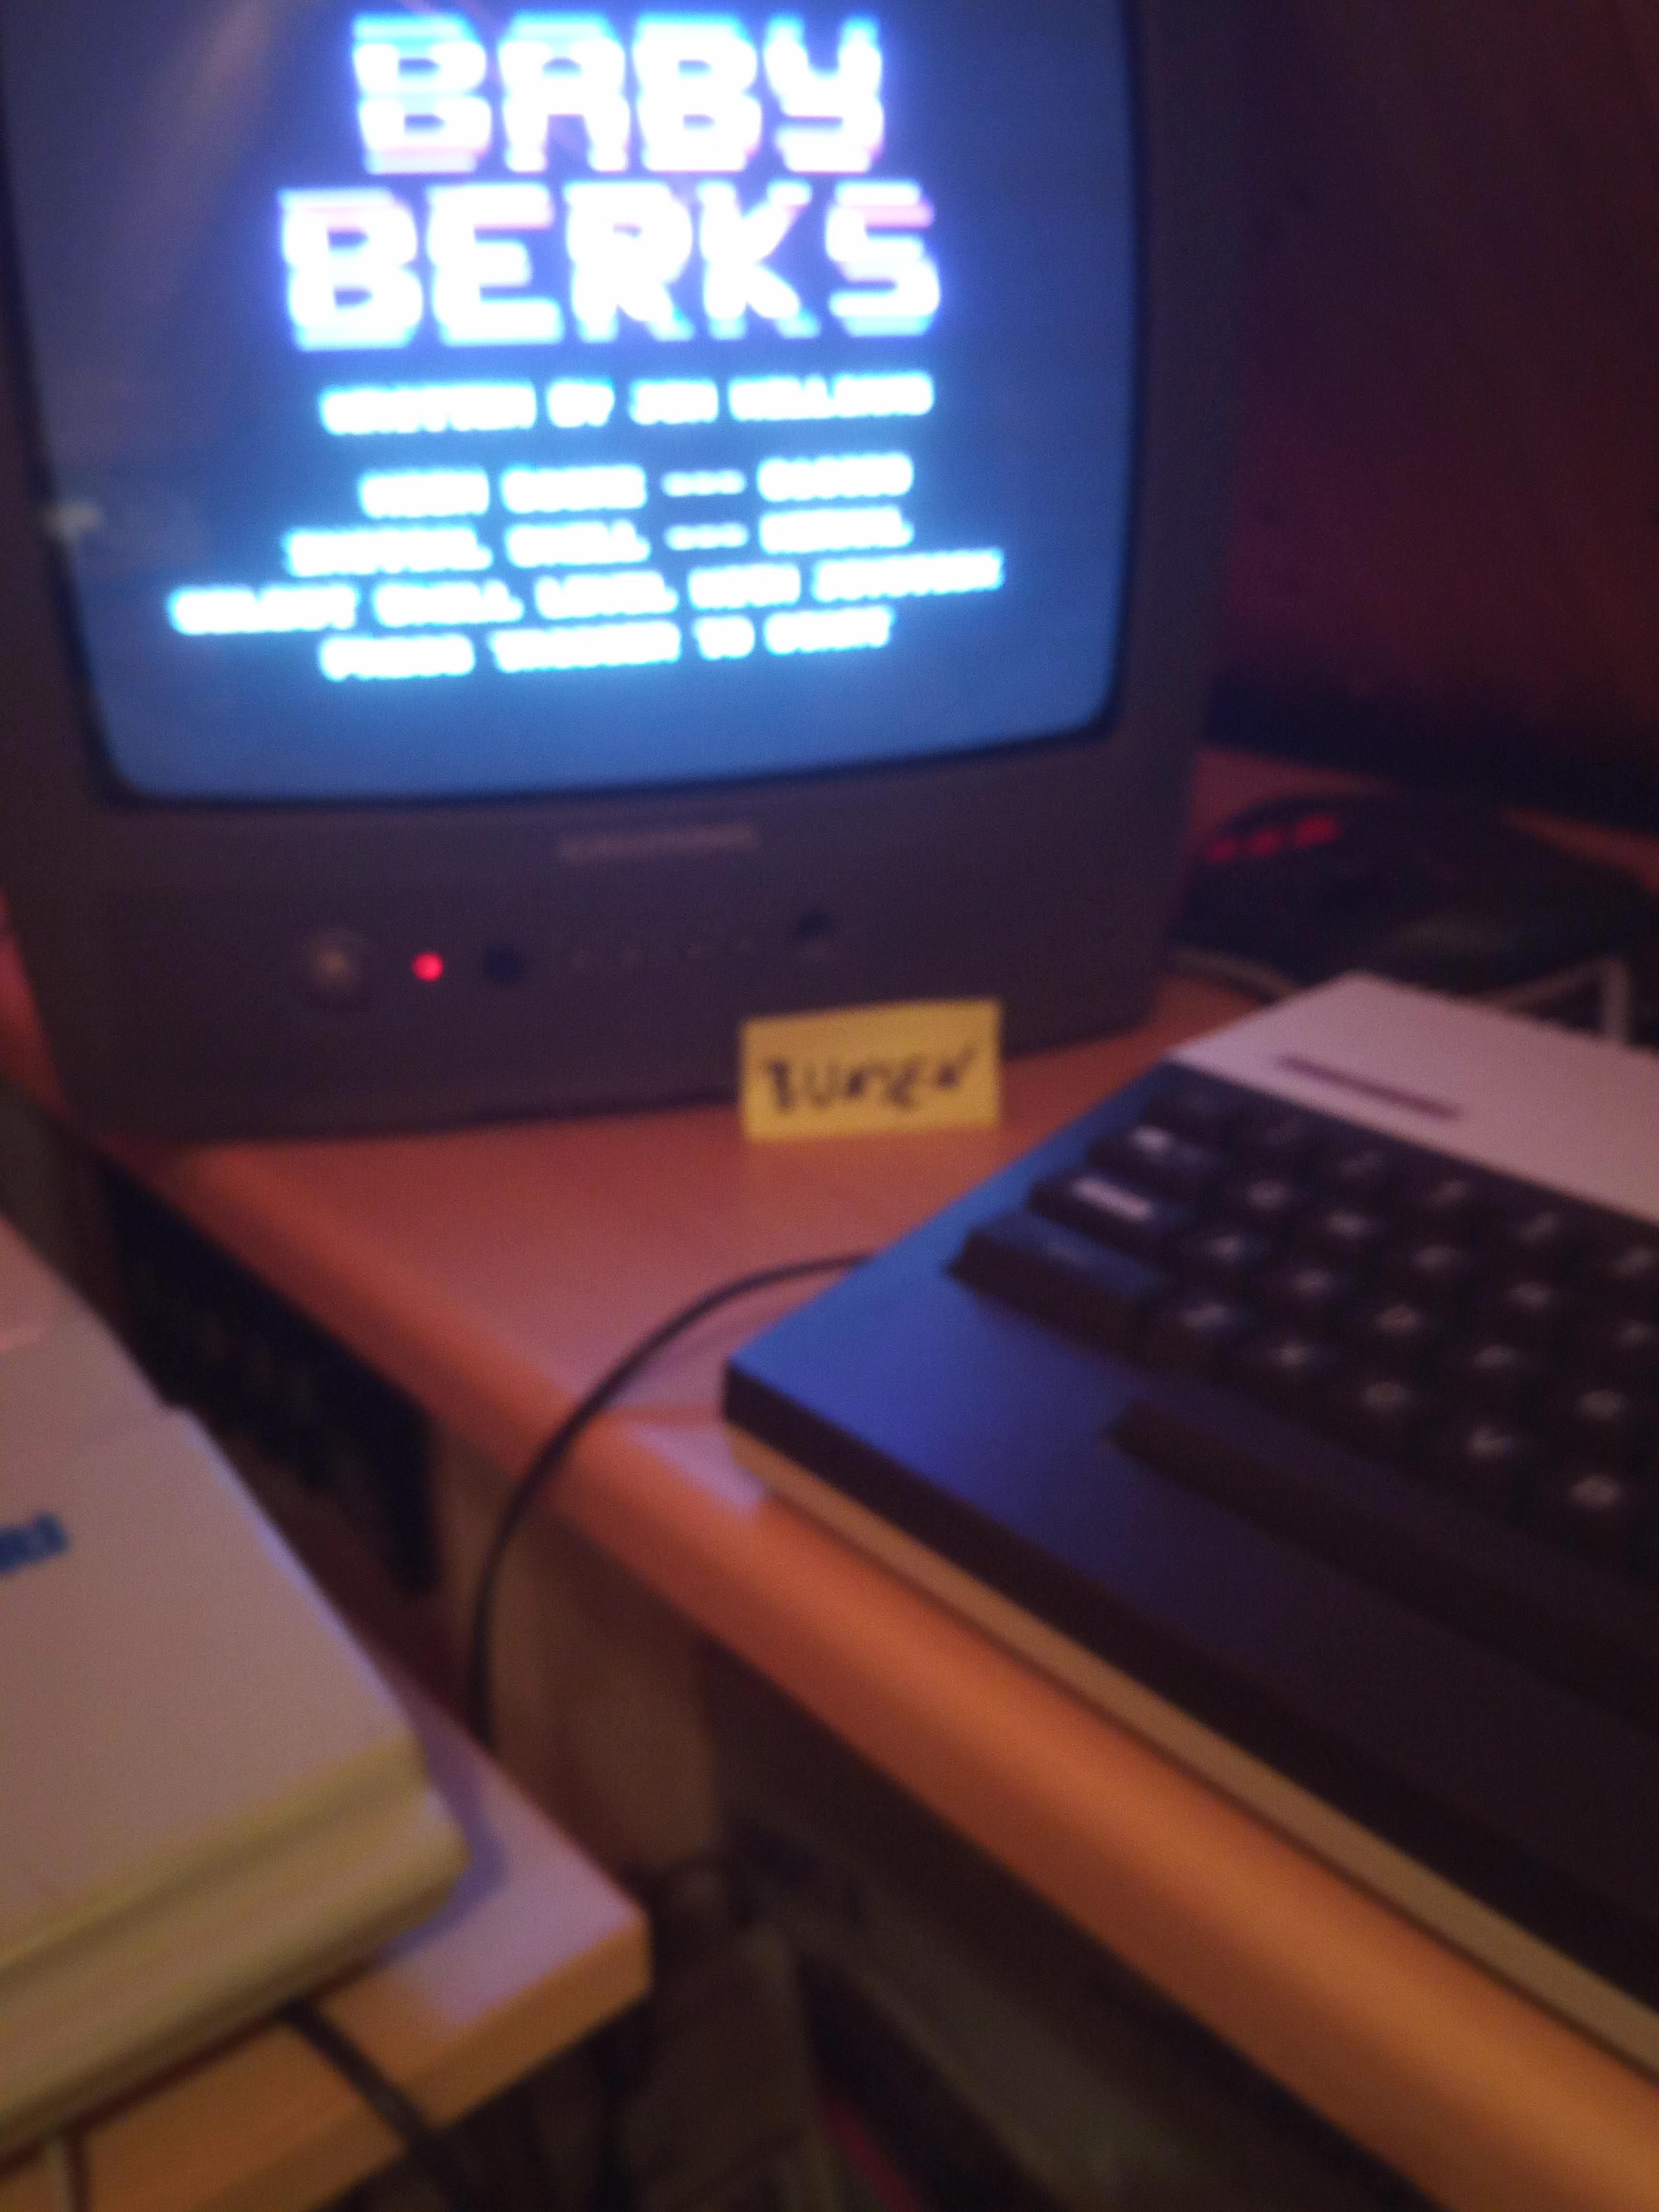 Bunsen: Baby Berks [Skill: Normal] (Atari 400/800/XL/XE) 18,300 points on 2020-07-09 15:33:25